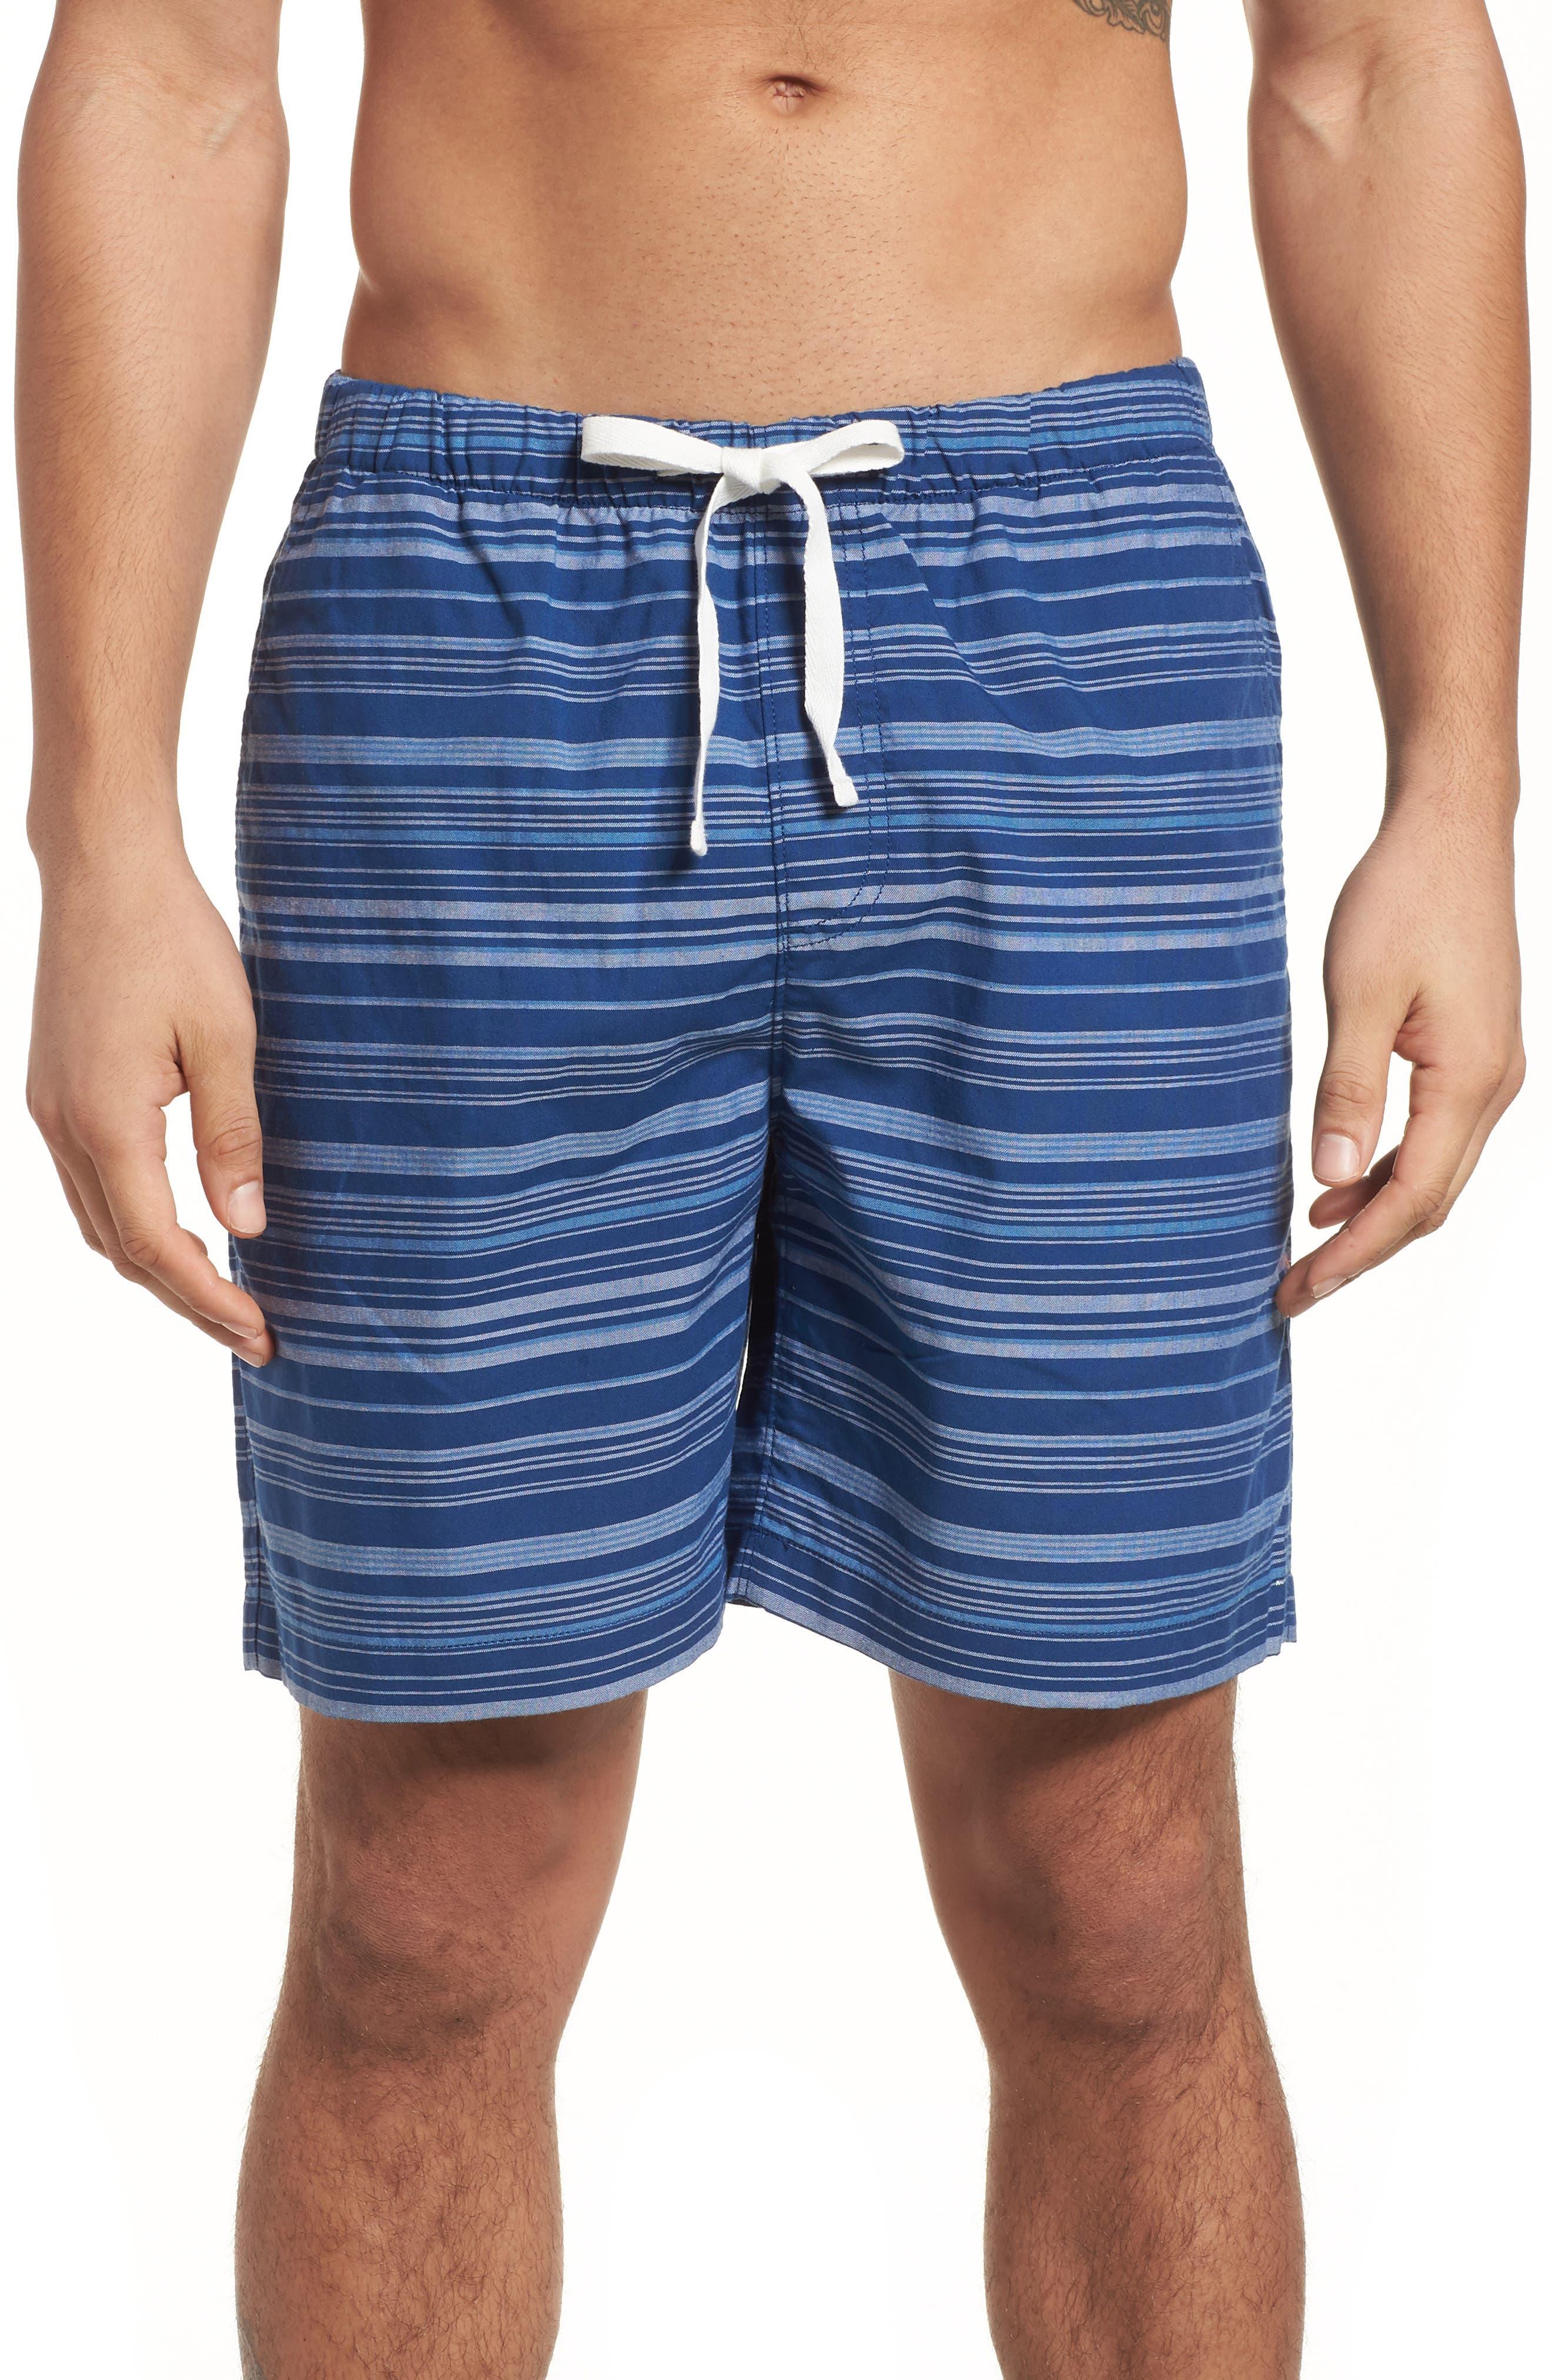 Southern Tide Hammock Board Shorts